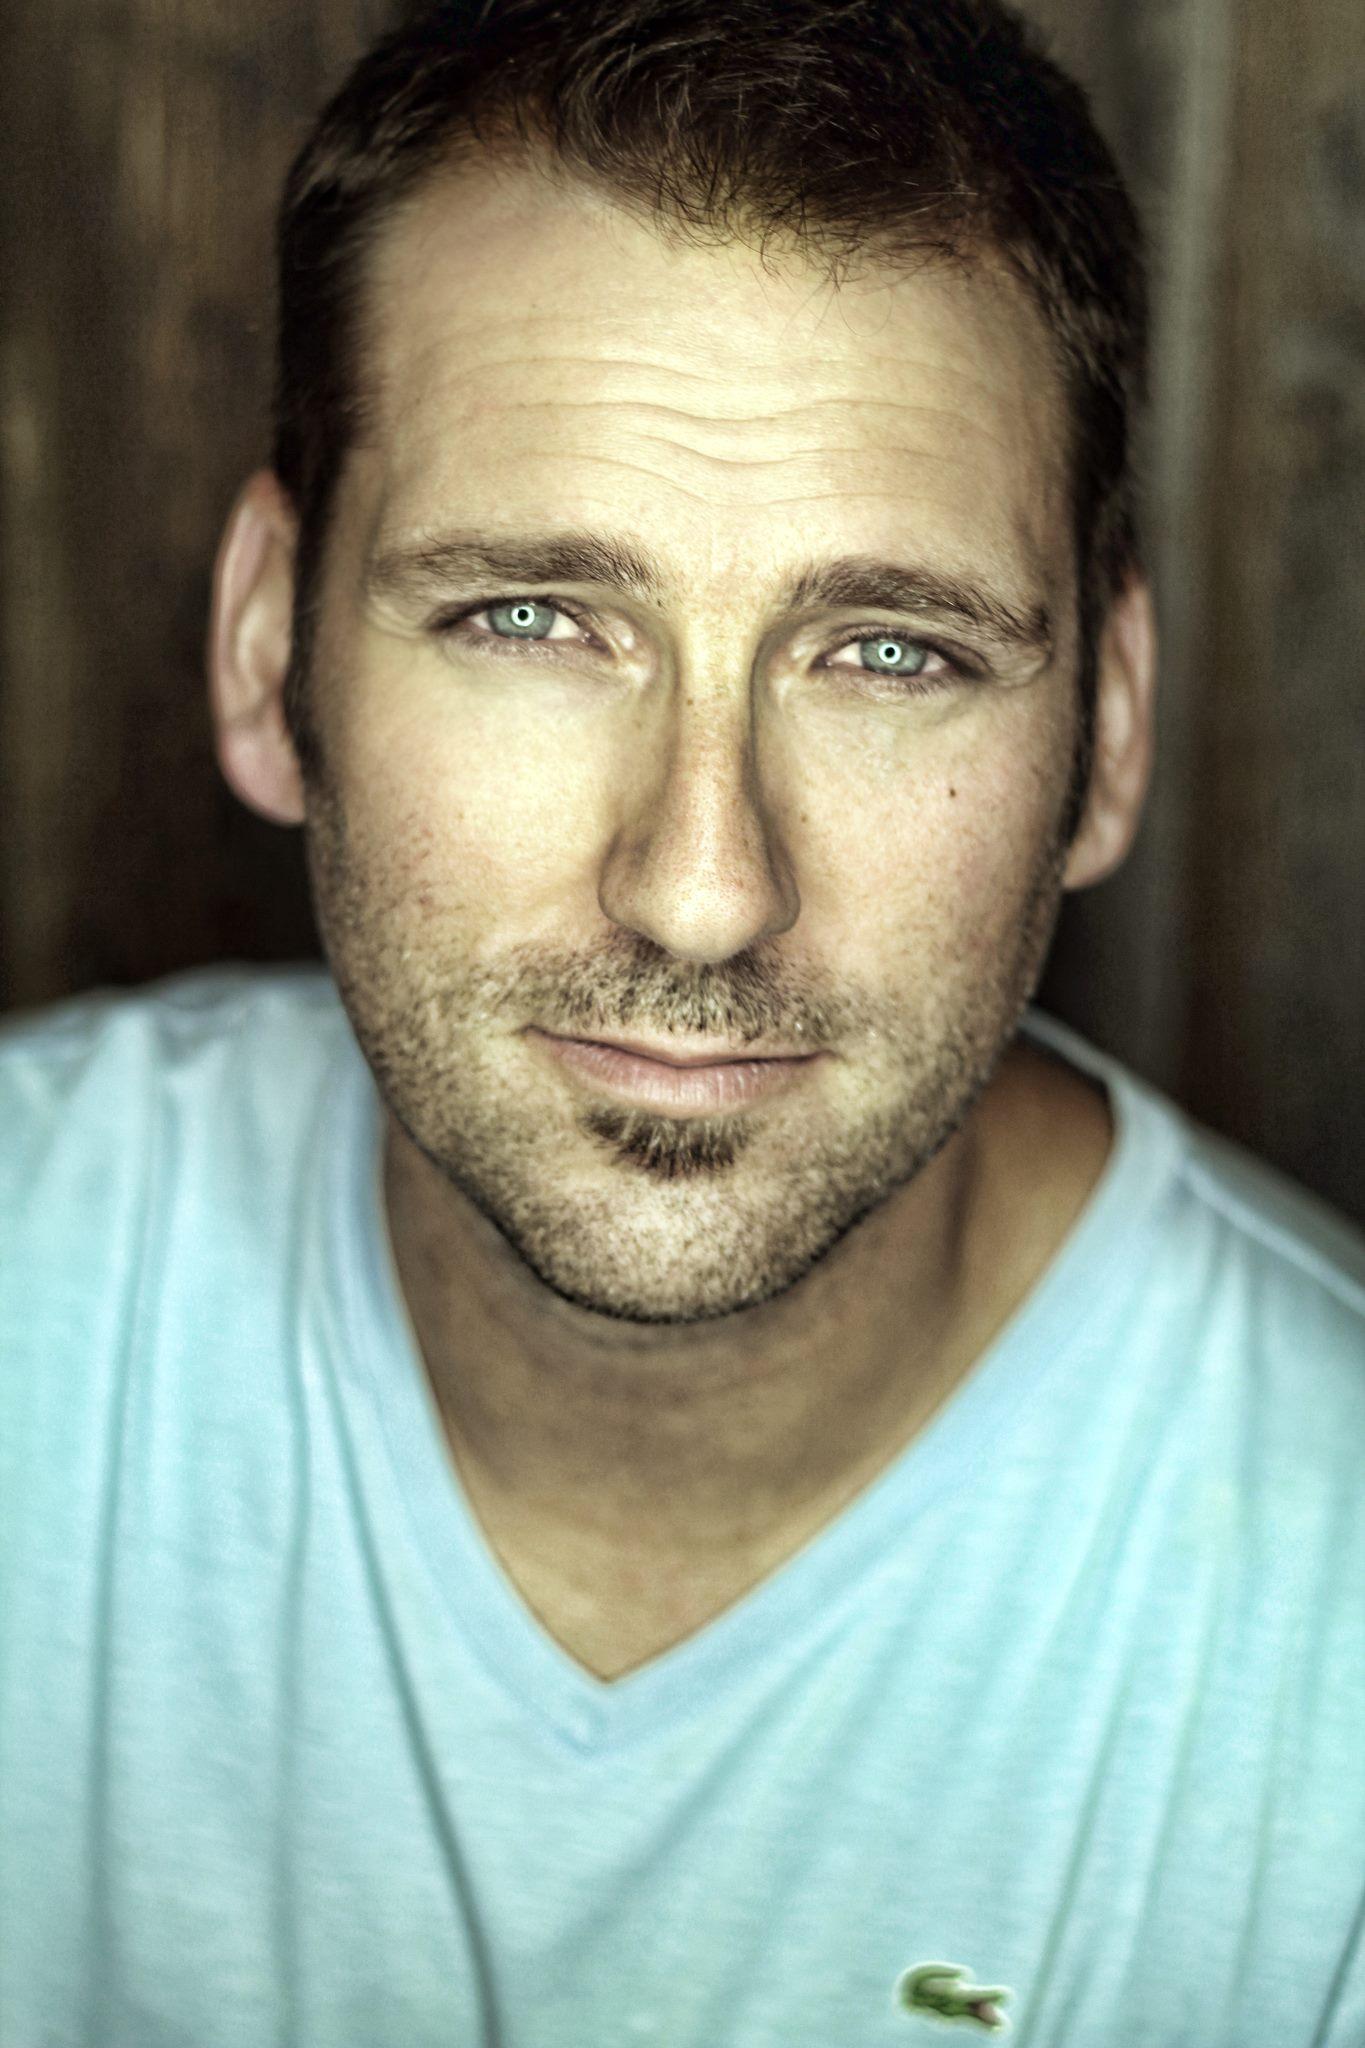 Jason Swenk